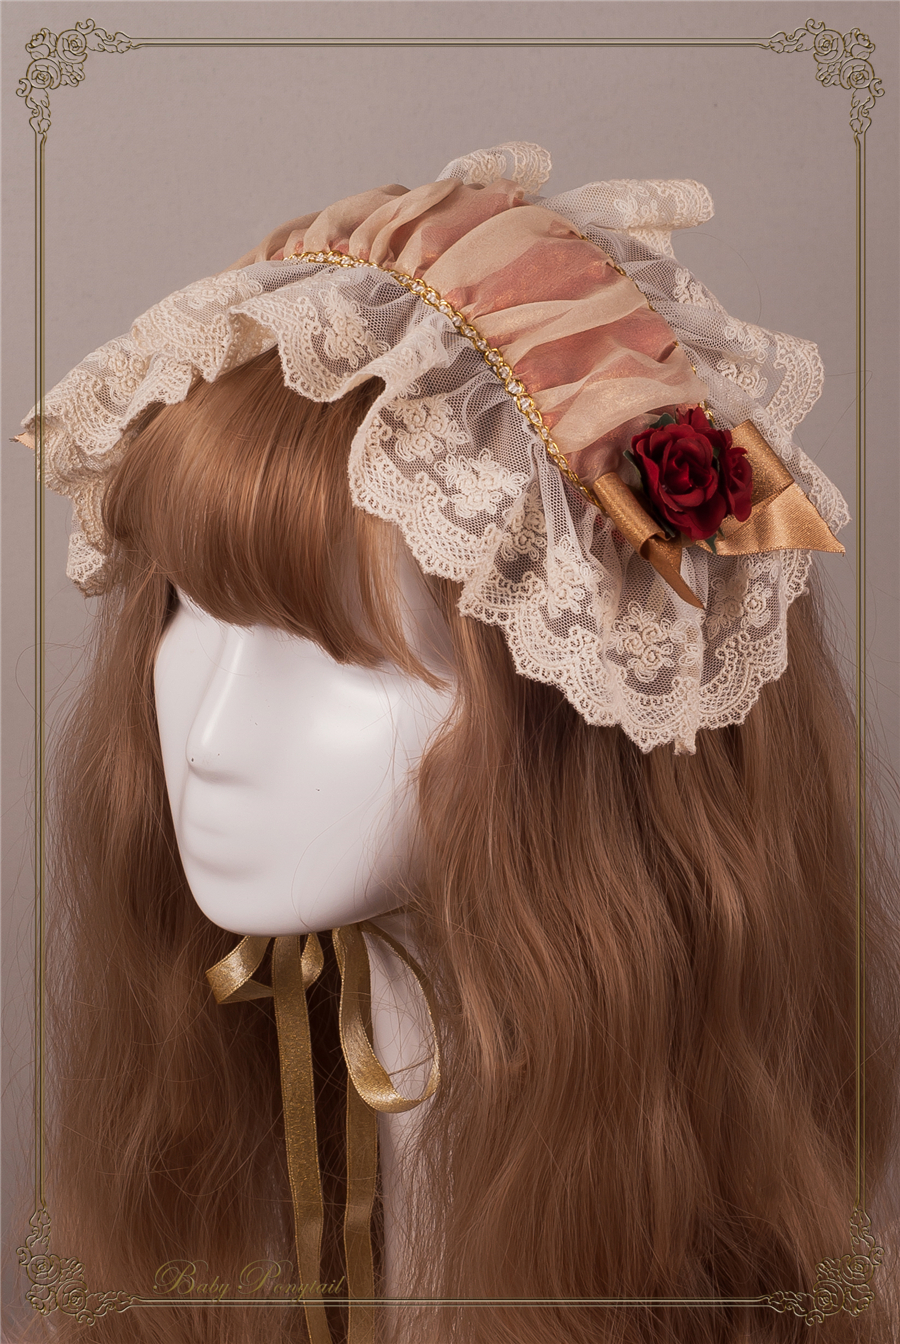 BabyPonytail_Rose Battle_Stock Photo_Petite Rose Head Dress Amber_11.jpg